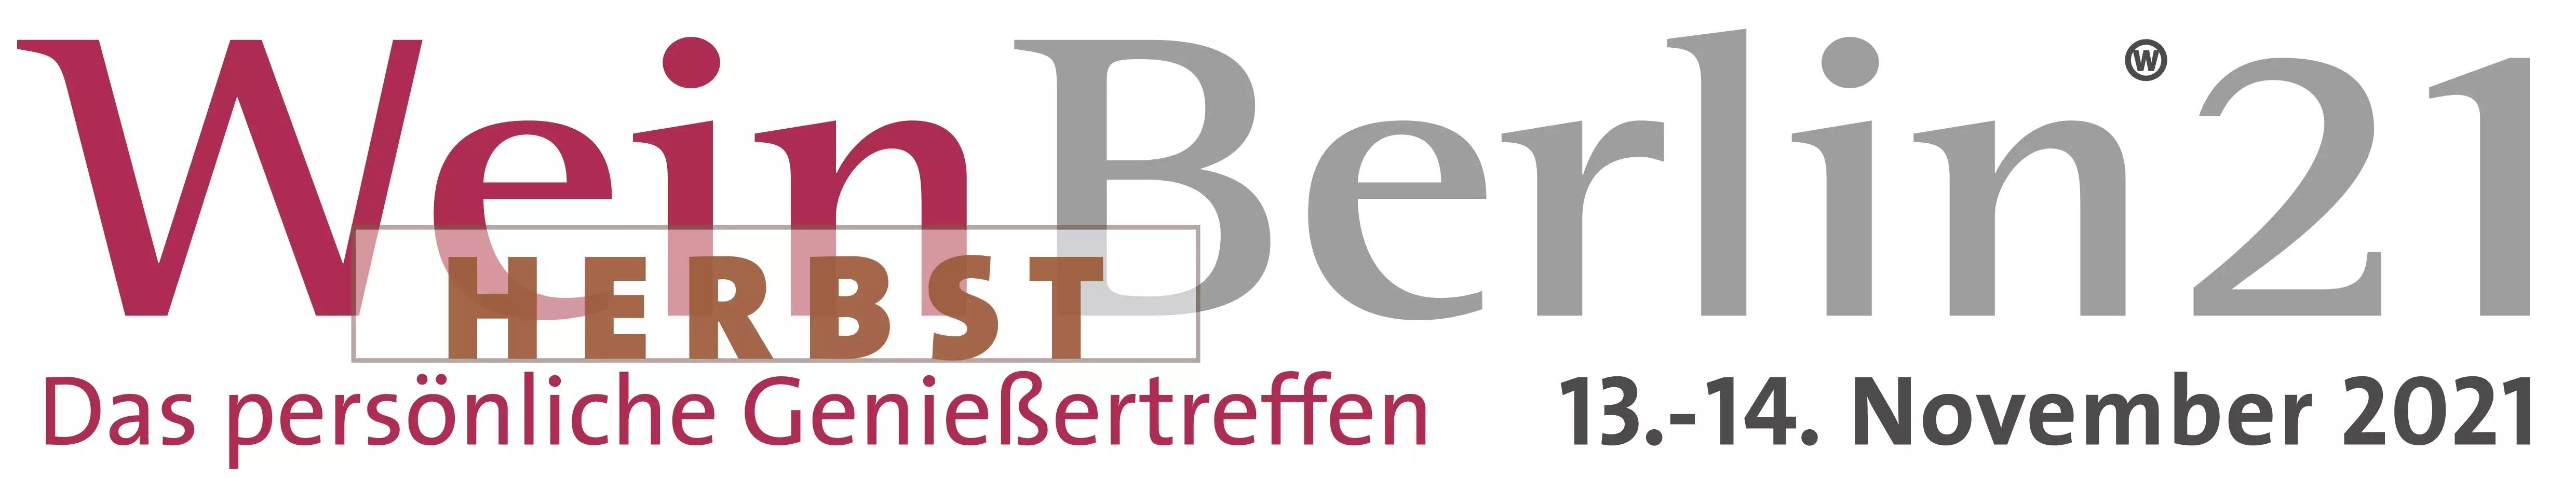 WeinBerlin Herbst 2021